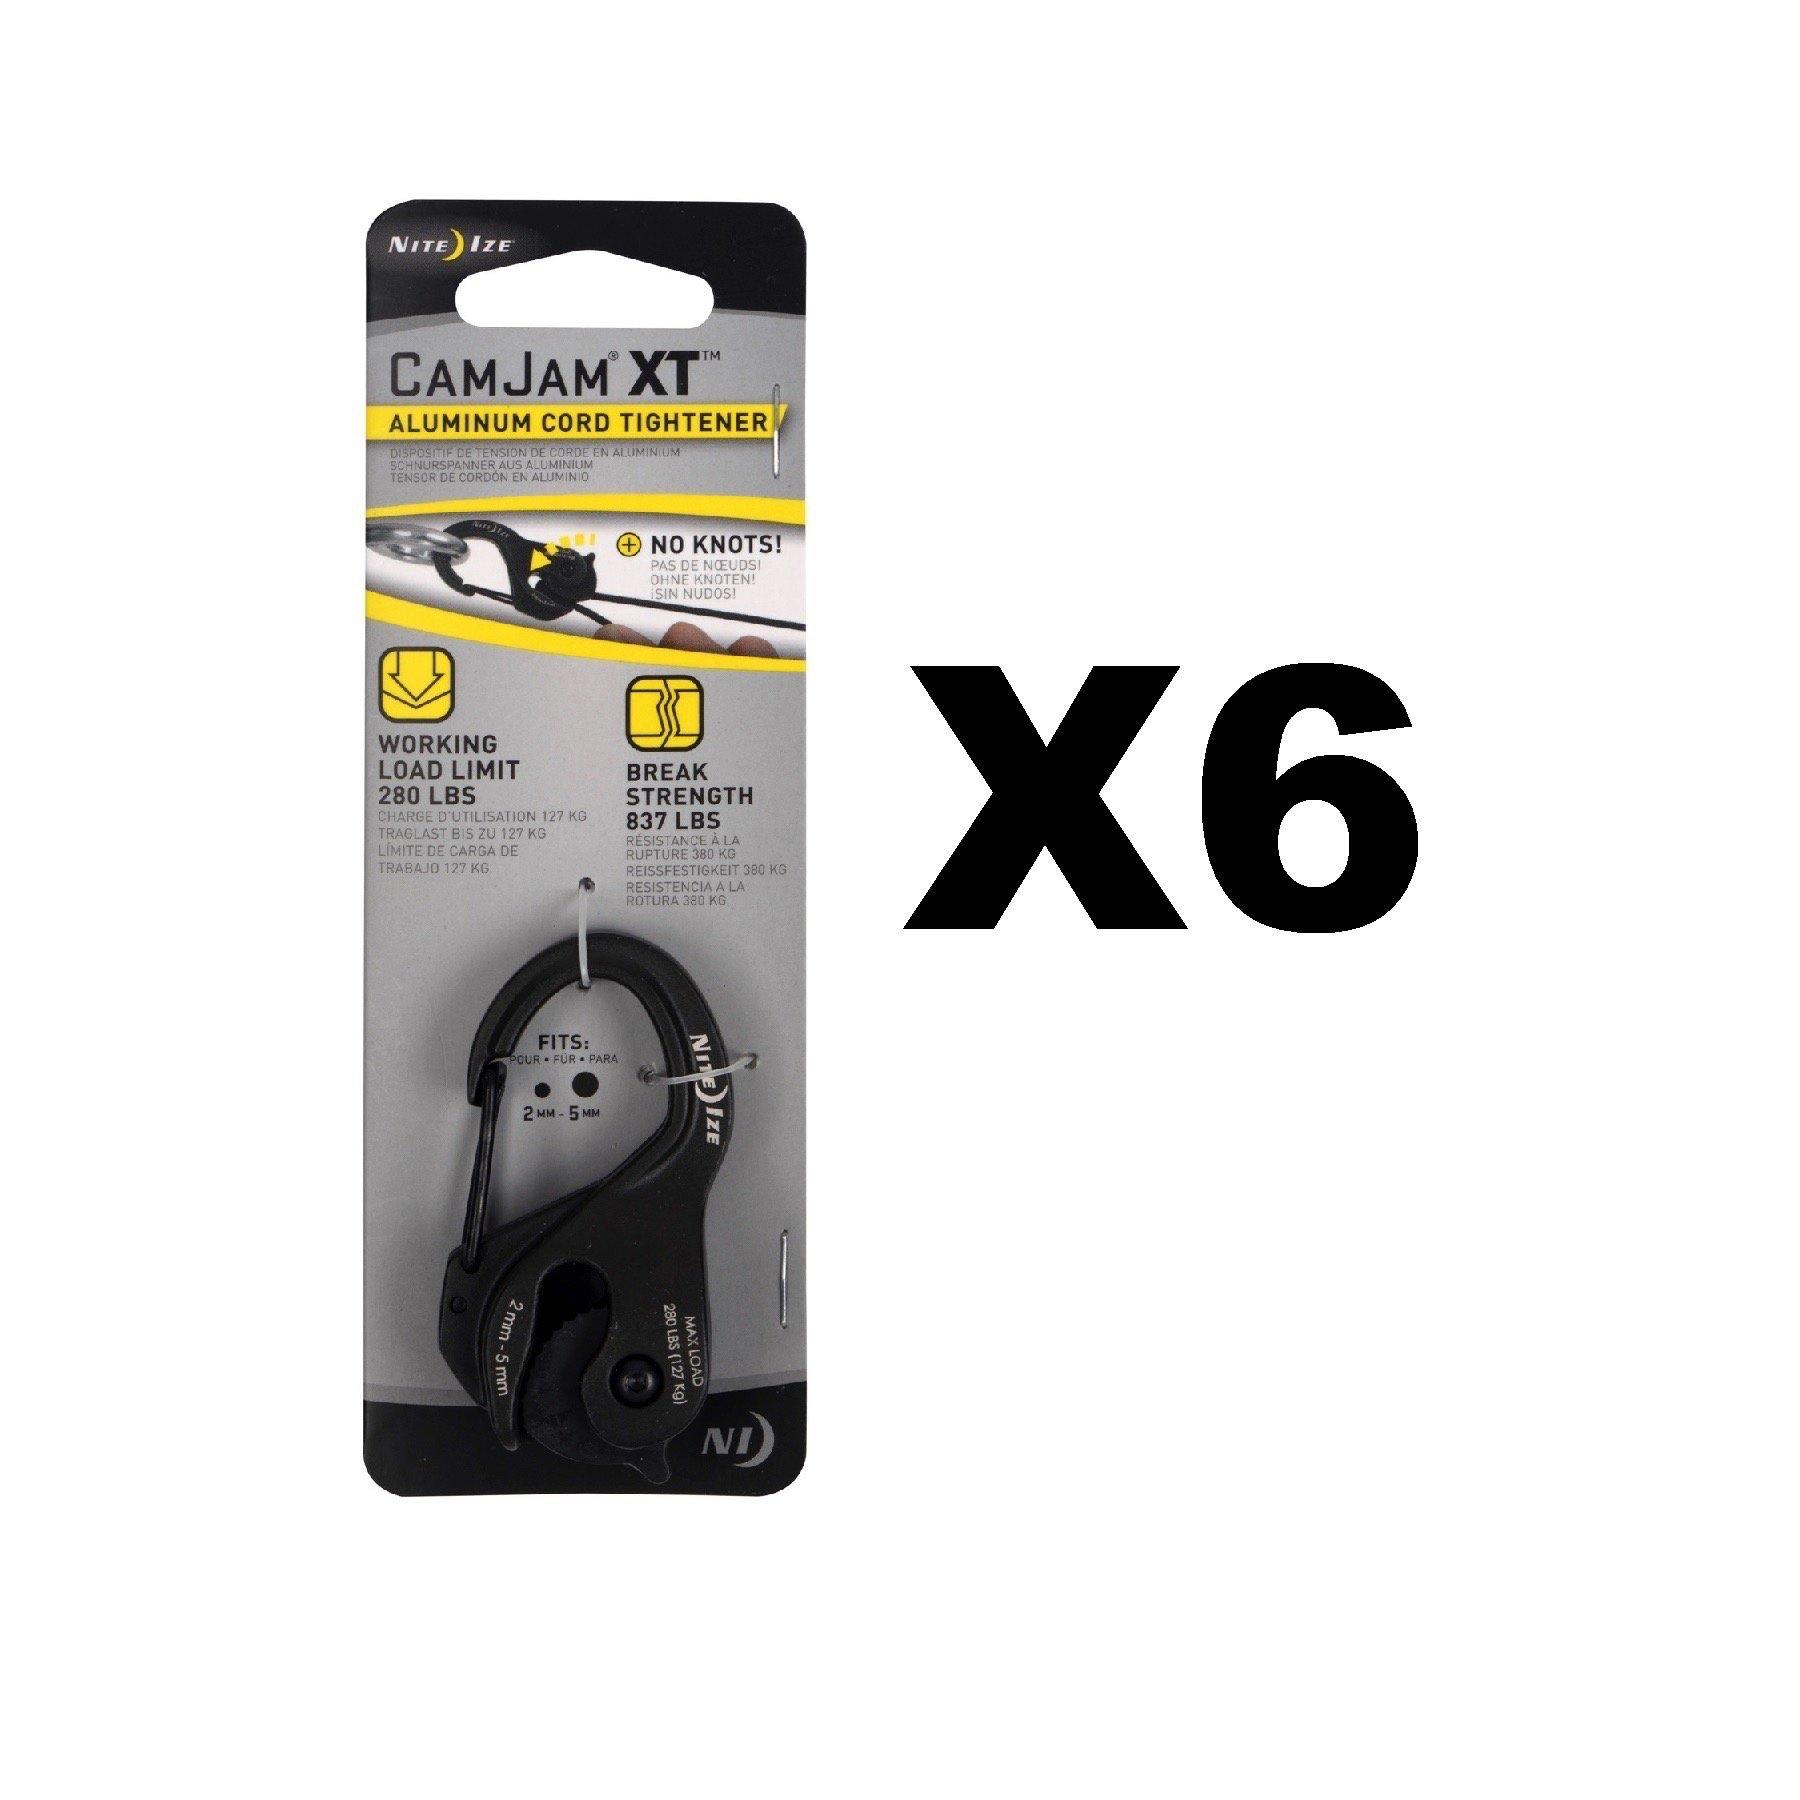 Nite Ize CamJam XT Black Aluminum Rope & Cord Tightener Tie Down Tool (6-Pack)